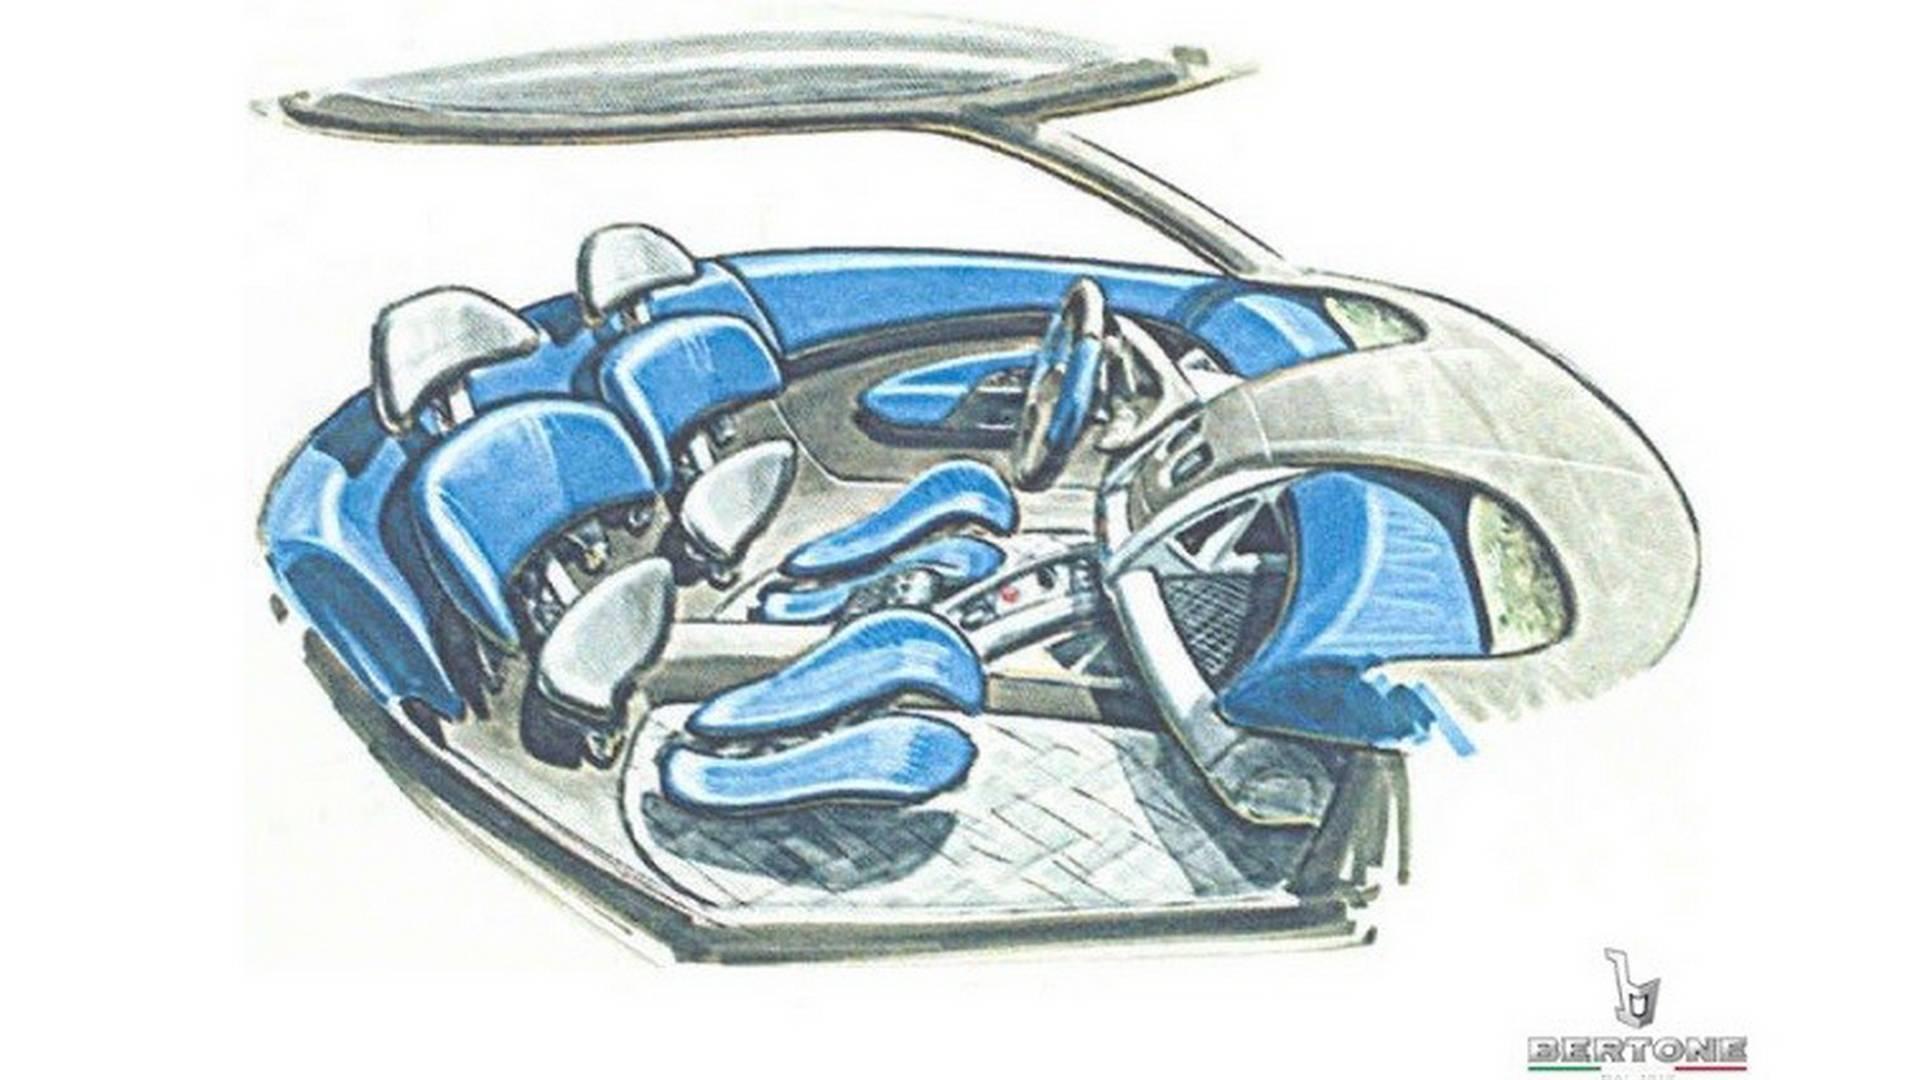 1998-bertone-bmw-pickster-concept15